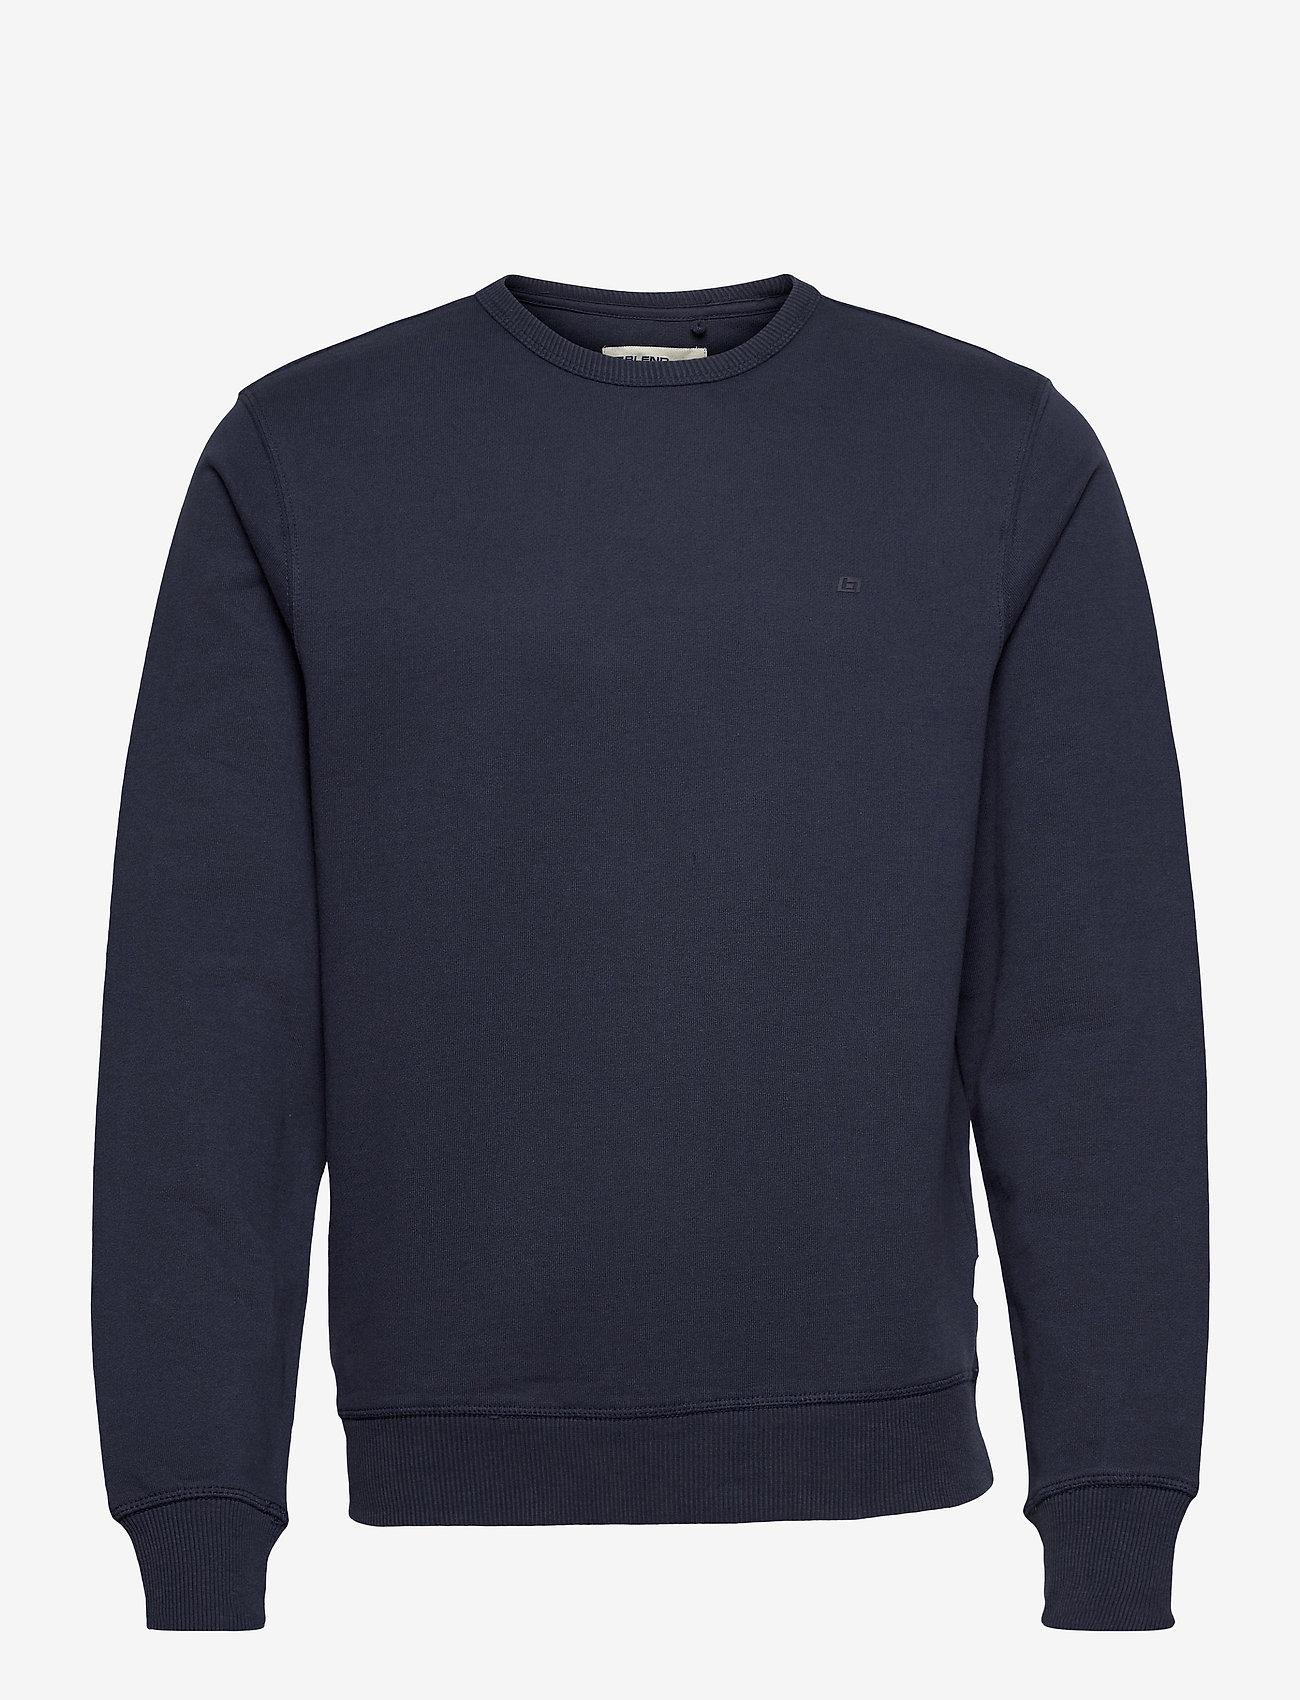 Blend - Sweatshirt - basic sweatshirts - dress blues - 0